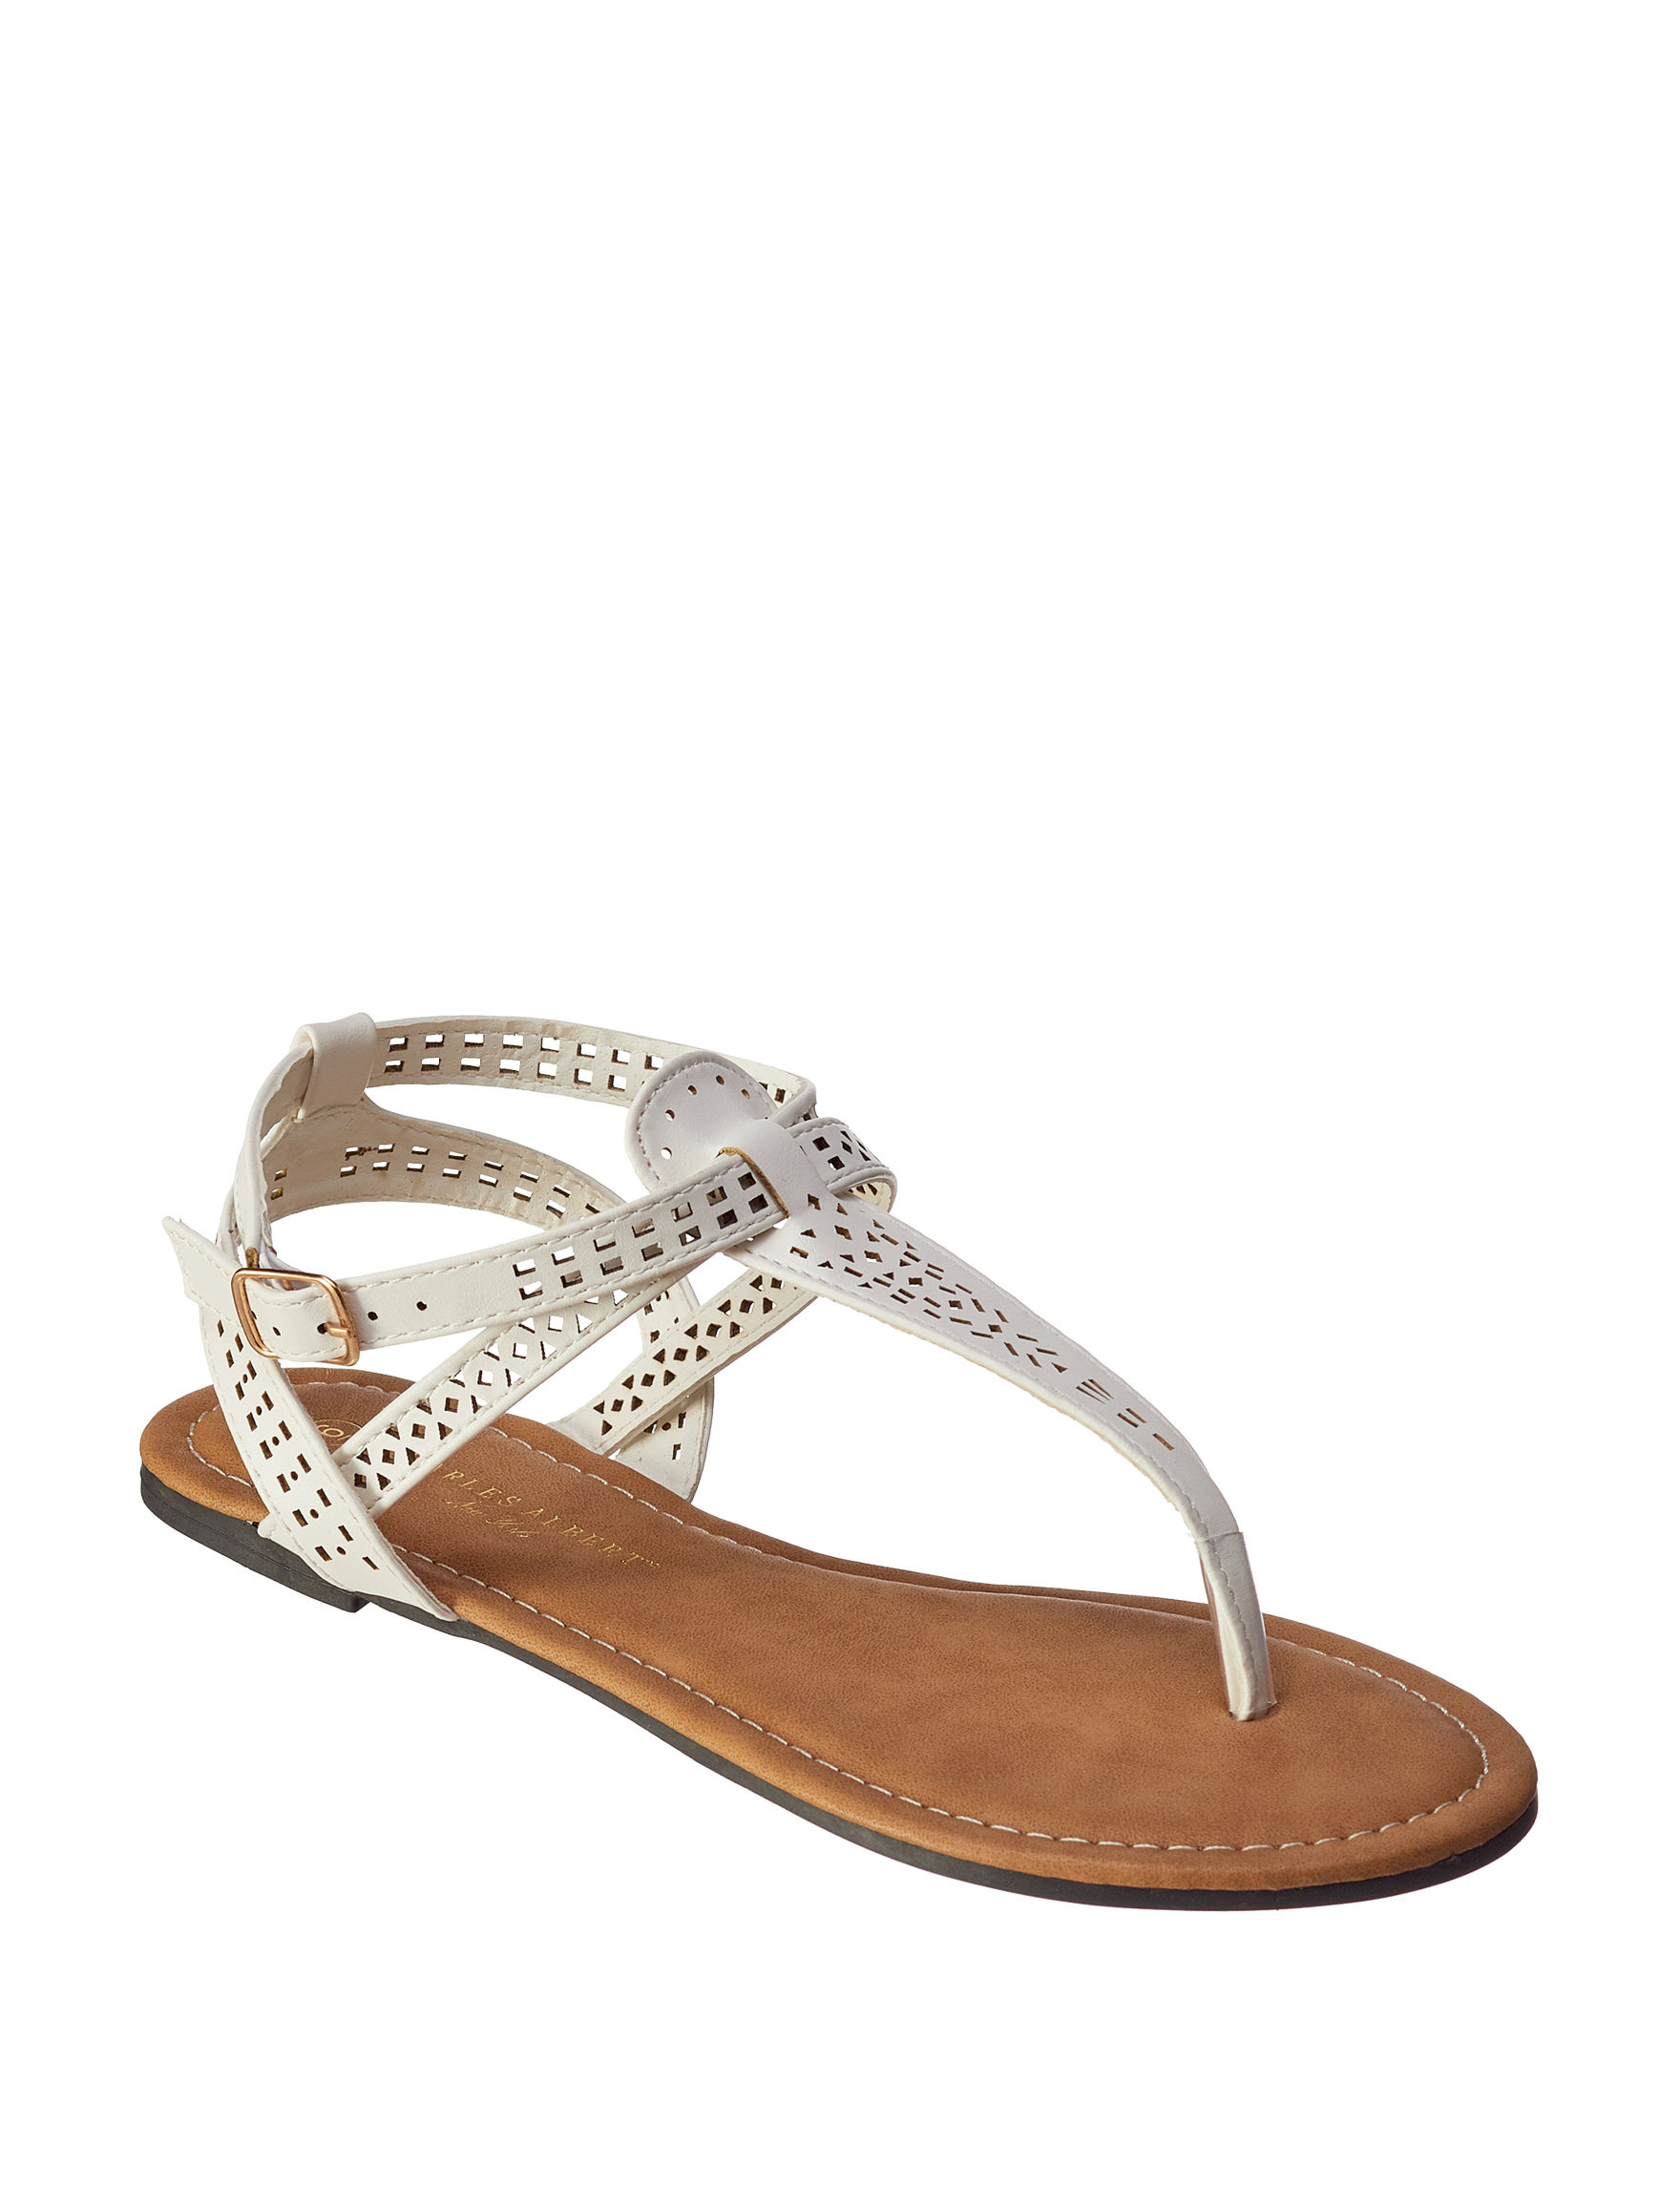 Charles Albert White Flat Sandals